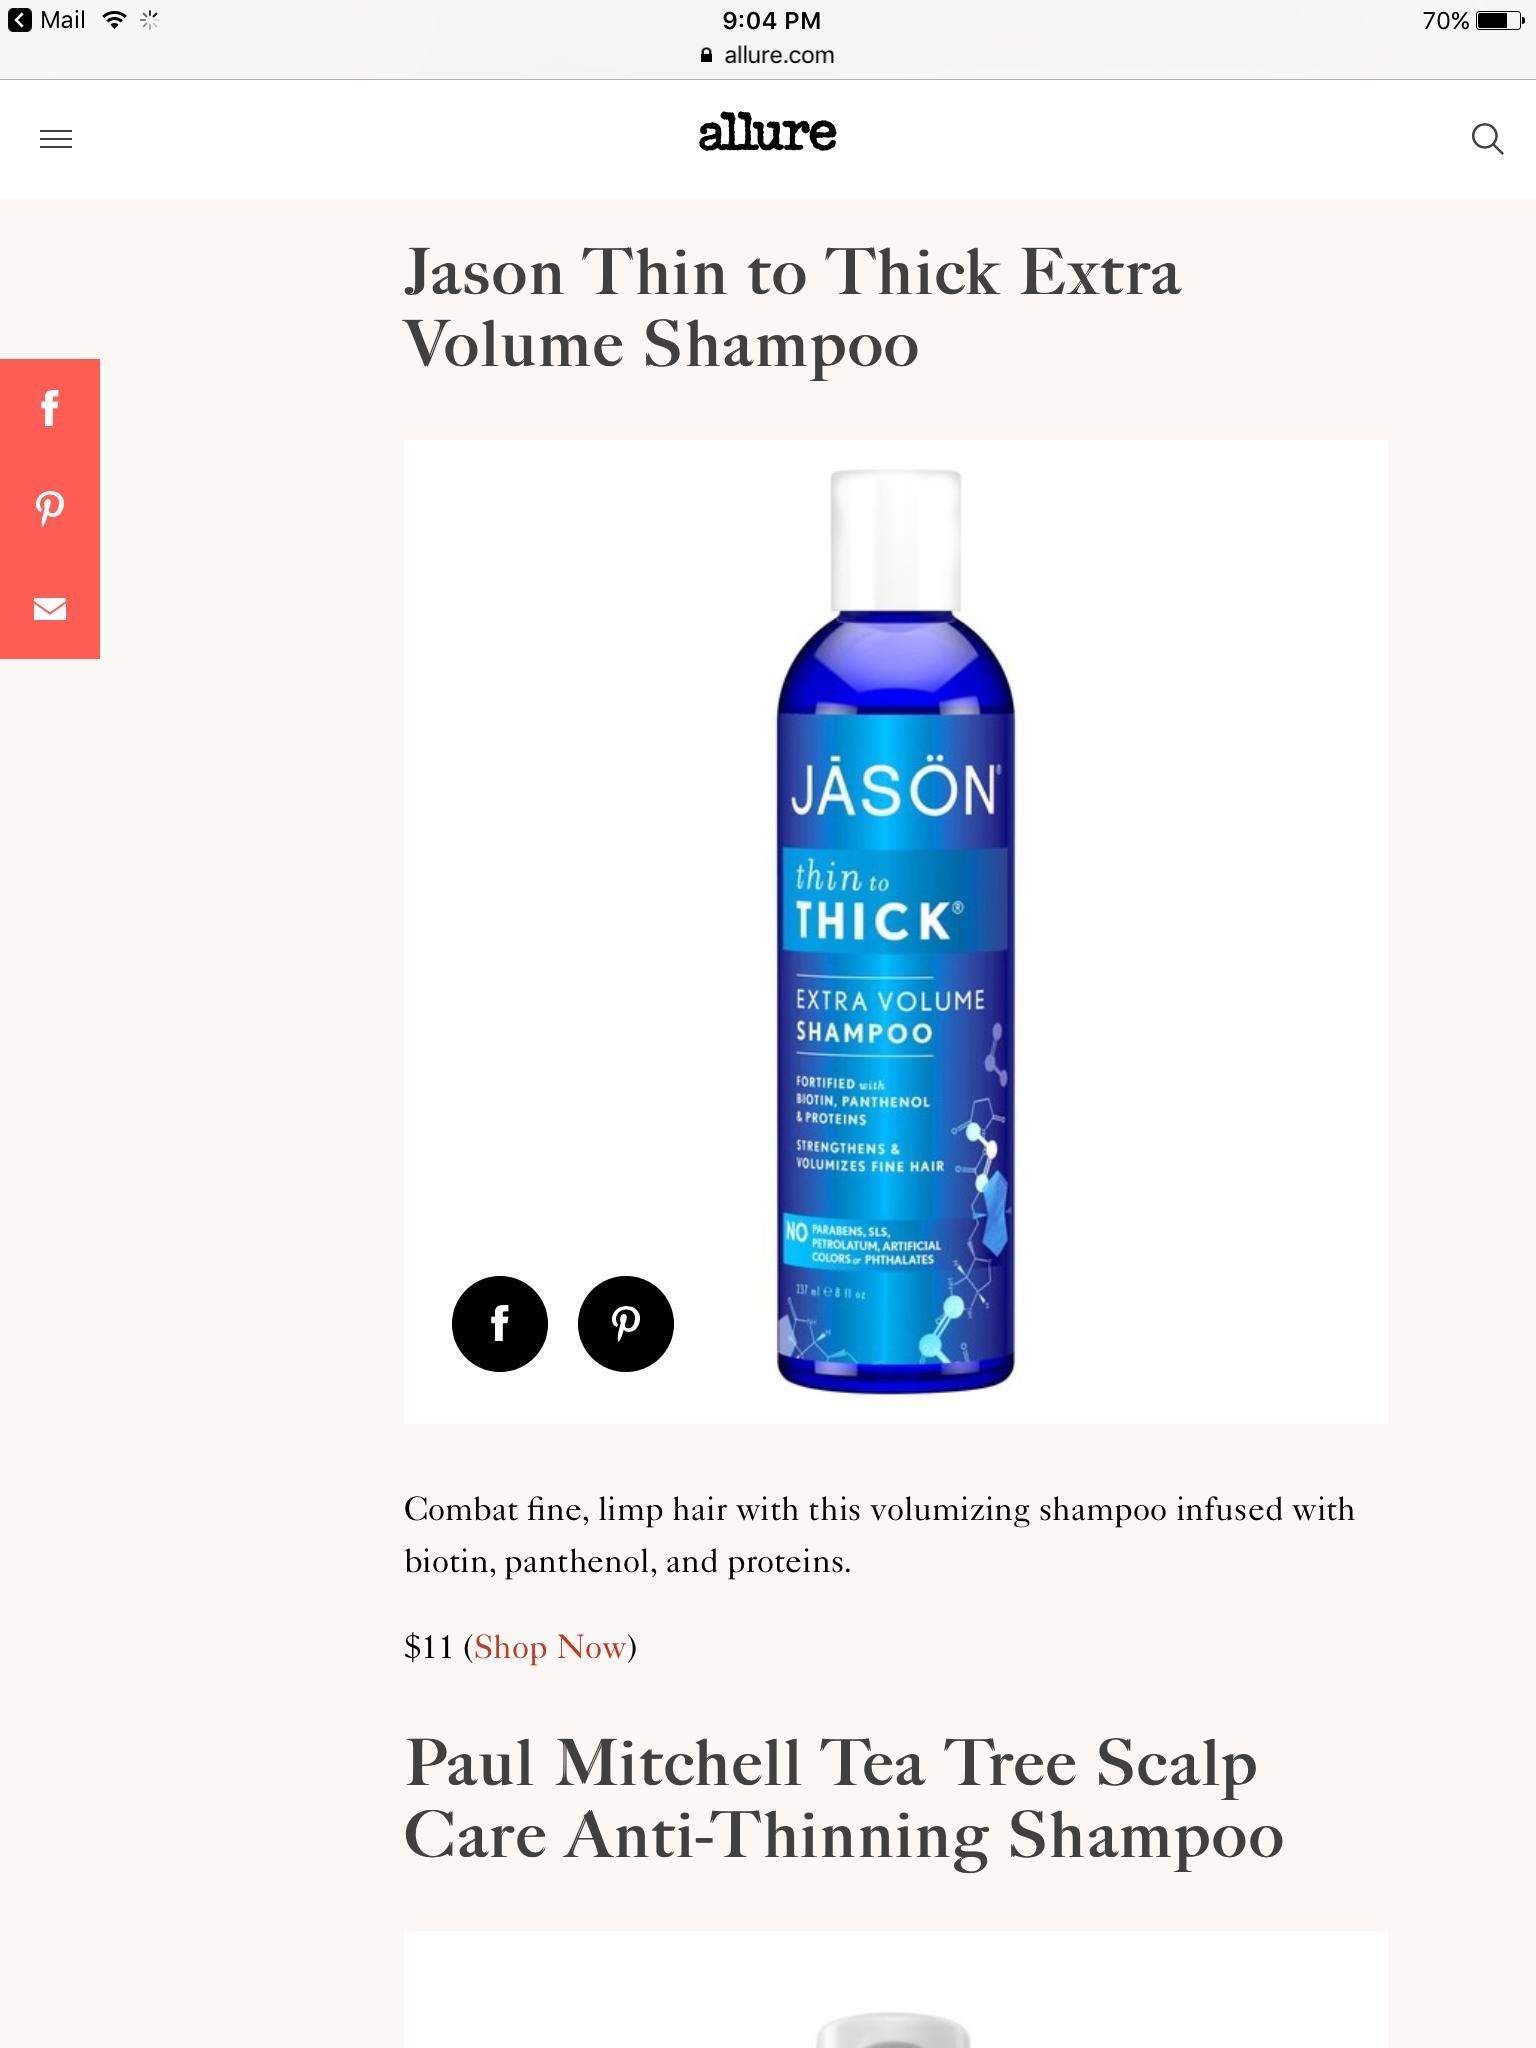 Jason Thin to thick Full volume shampoo Tea tree, Too